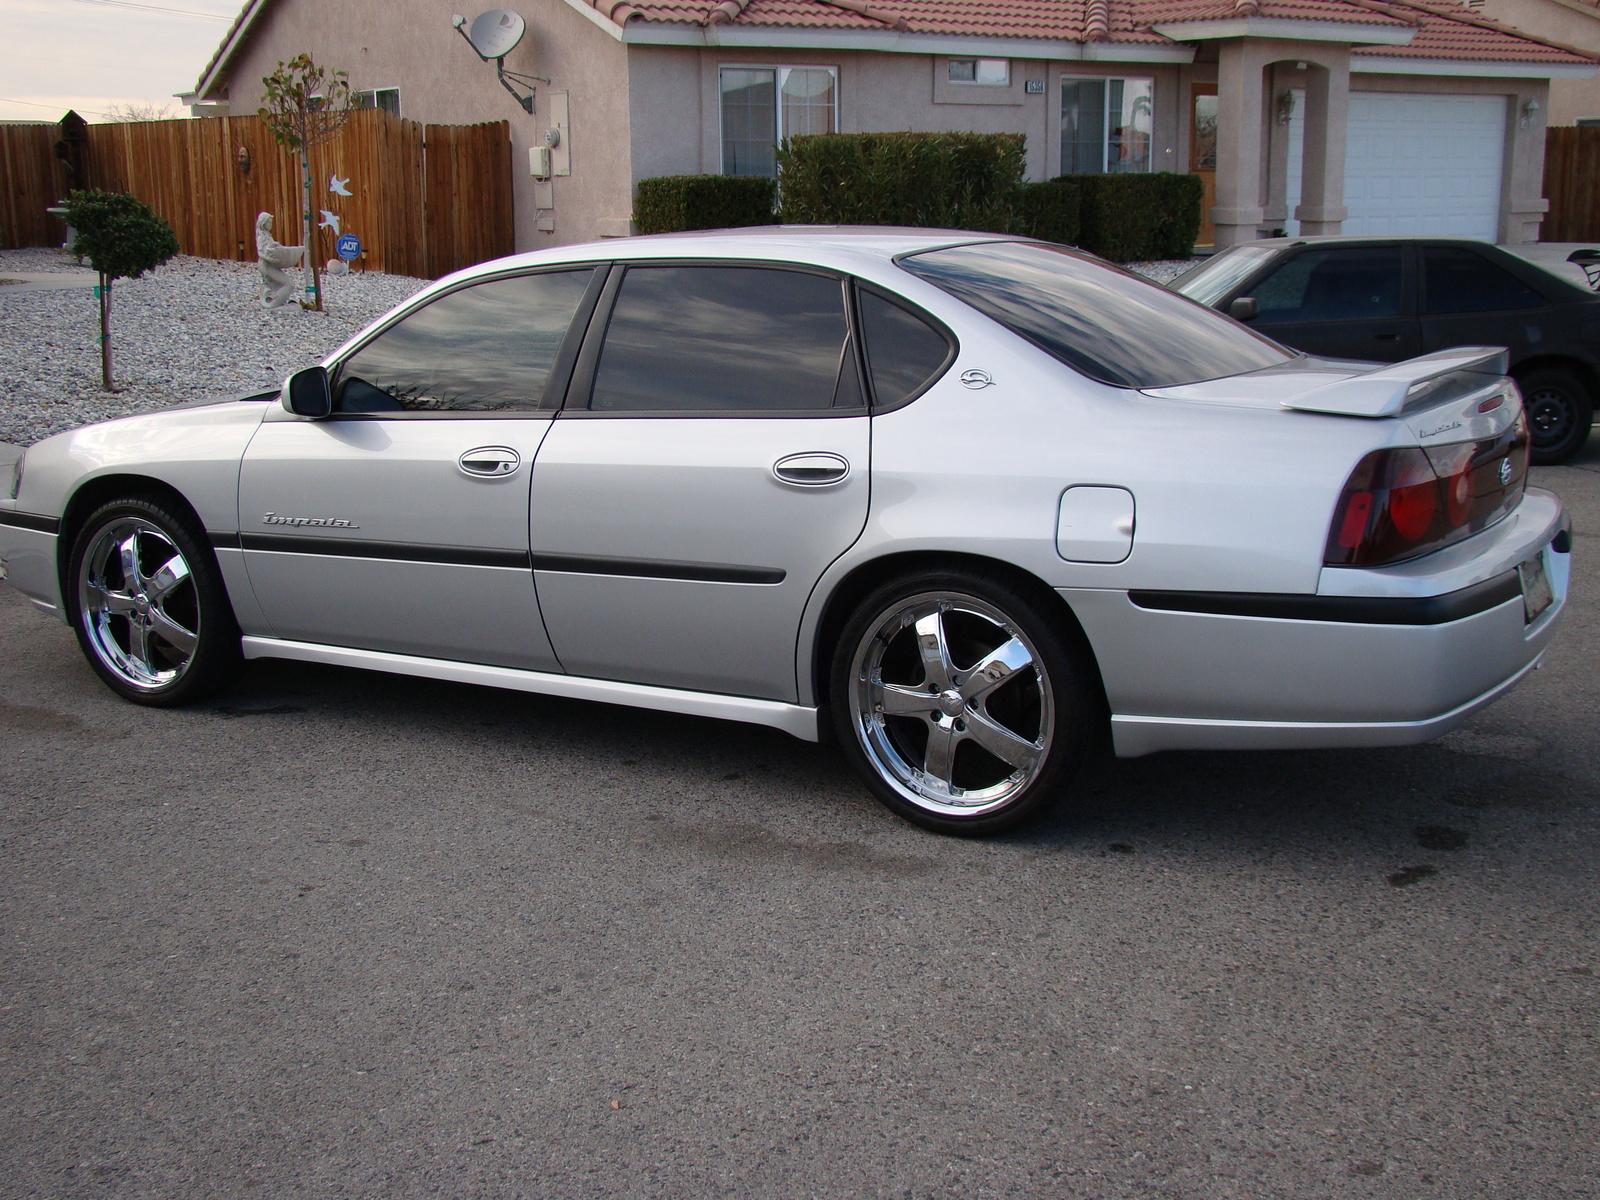 2003 Chevrolet Impala Pictures C825 pi36178305 also 1972 Chevrolet Impala Pictures C4322 further C  0810 1999 Chevy Camaro Z28 moreover Whipple Camaro Sc 29 T additionally 2017 Chevrolet Monte Carlo Ss km8 e97SqhHQk9KJO 7CX3QwyOh4SHM0mx  7CIUVRlHSc. on 2003 chevy camaro ss